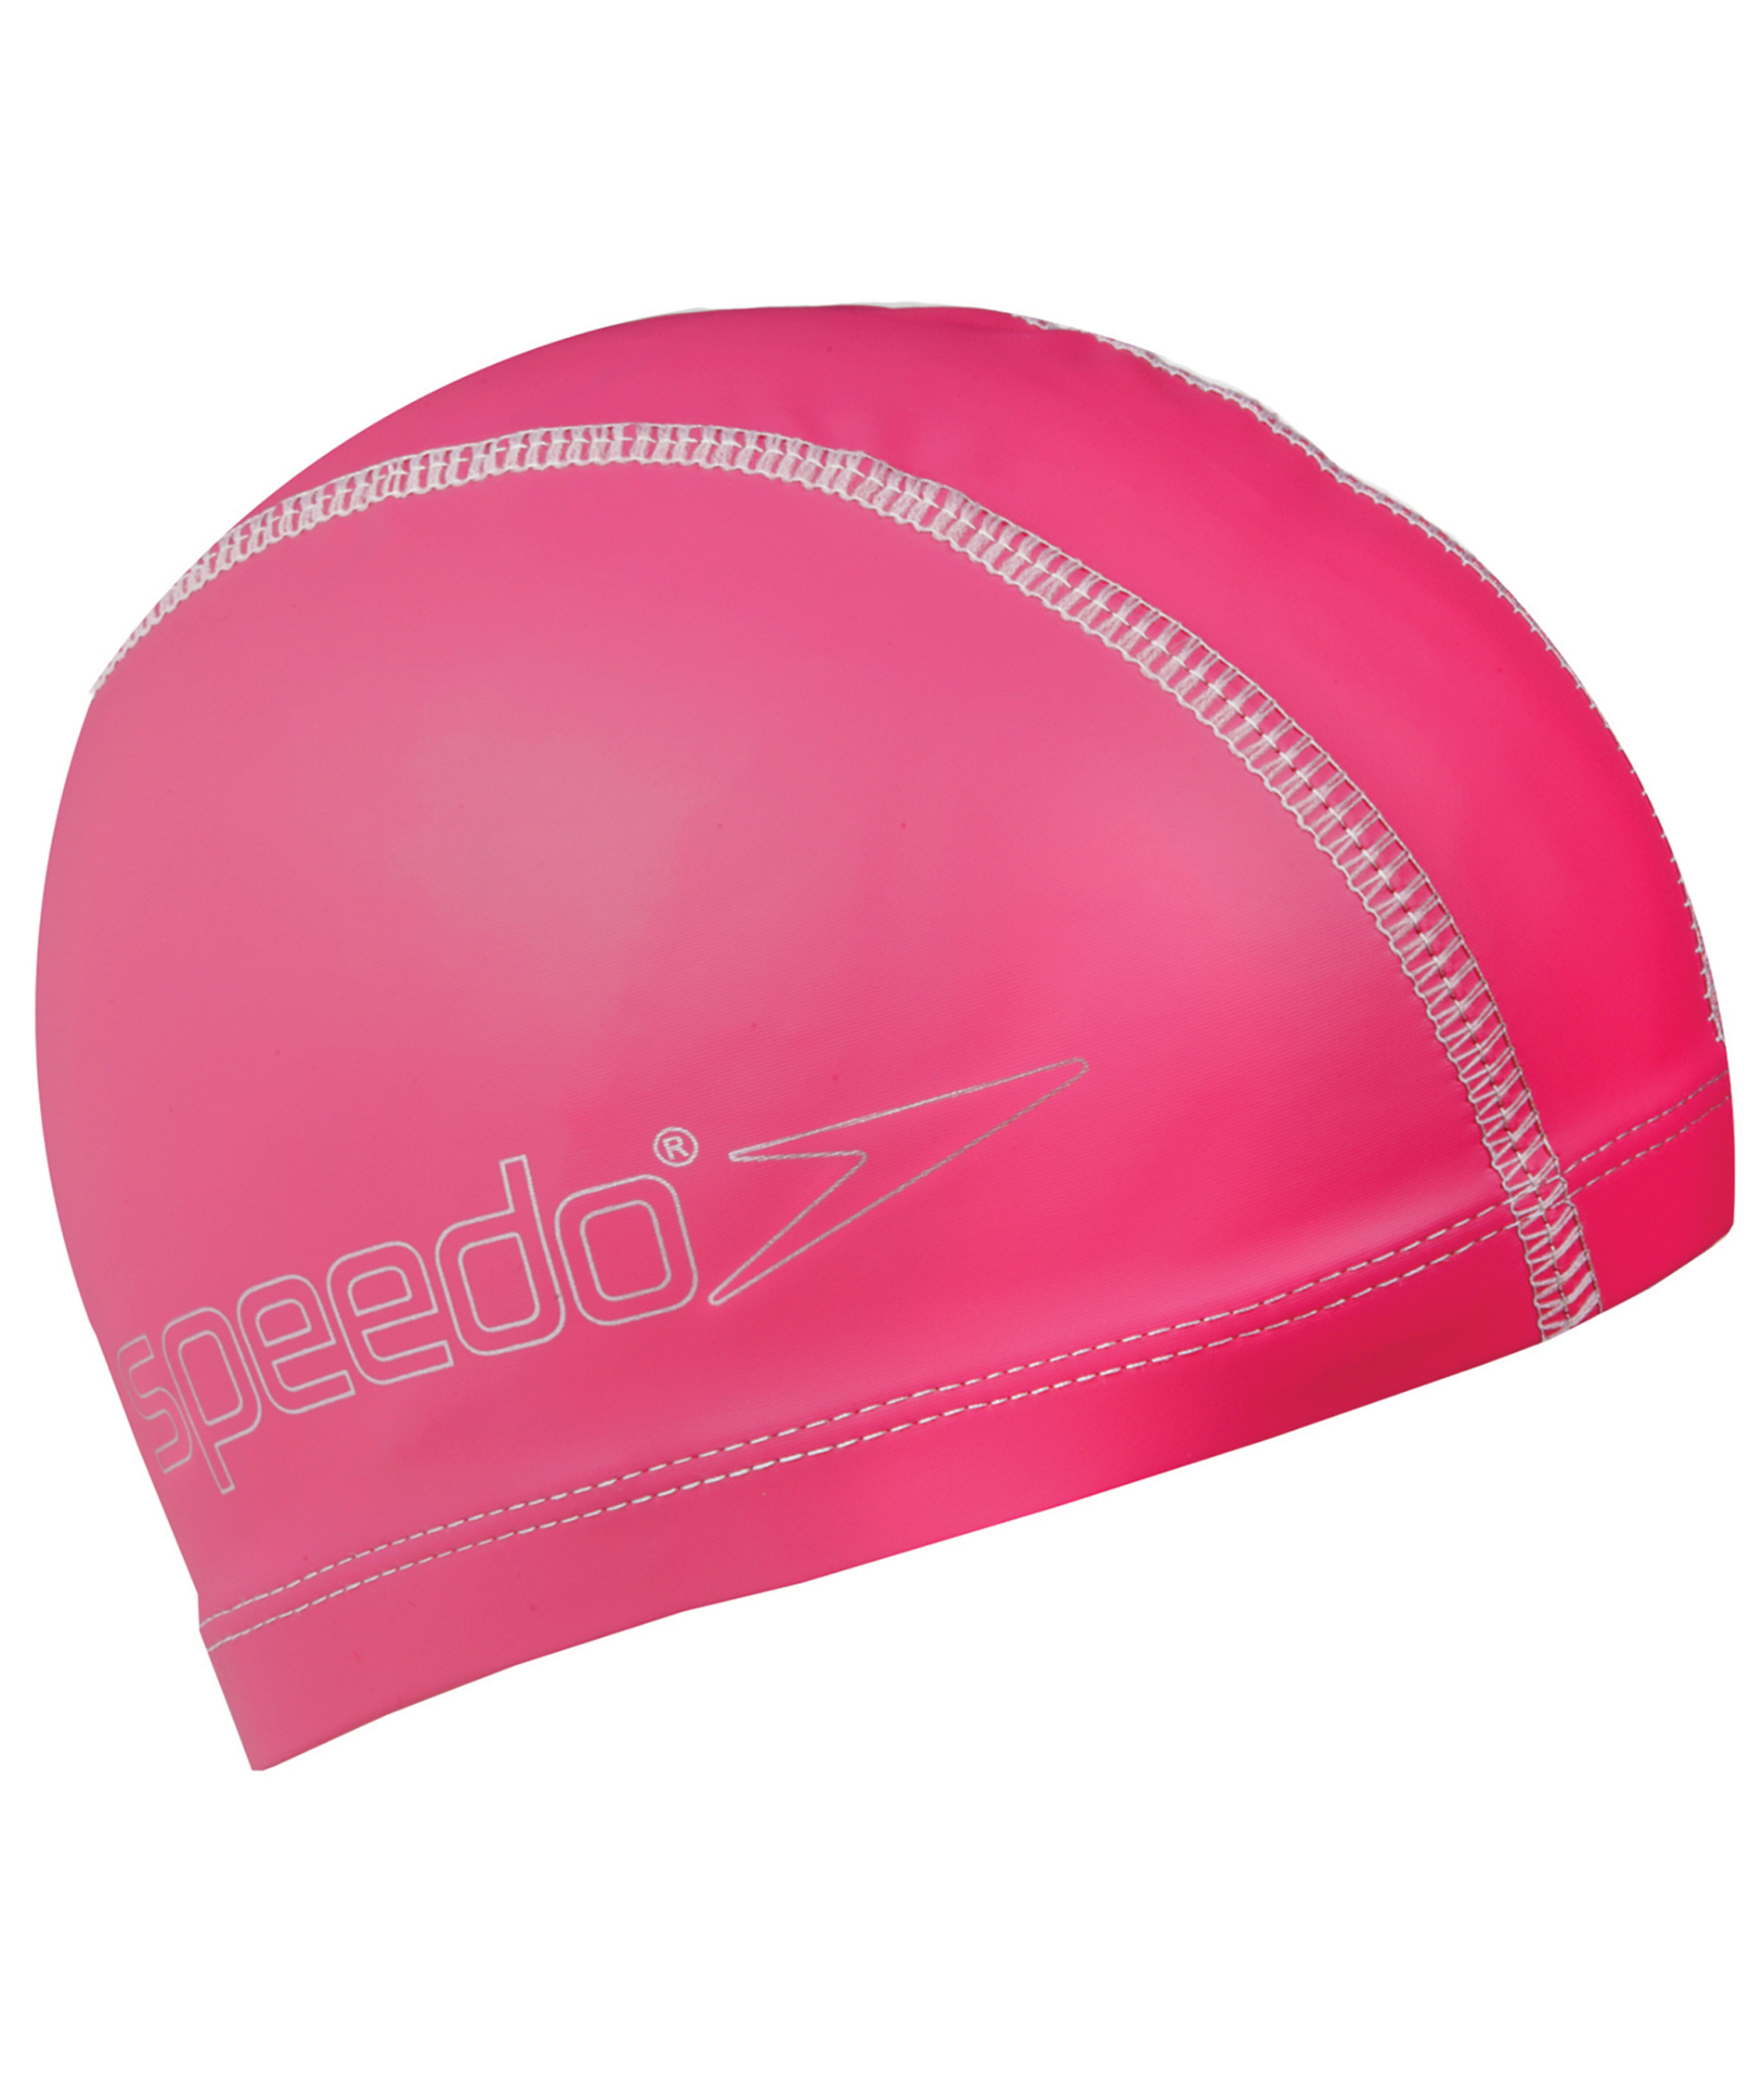 Speedo Junior Pace Cap - Pink